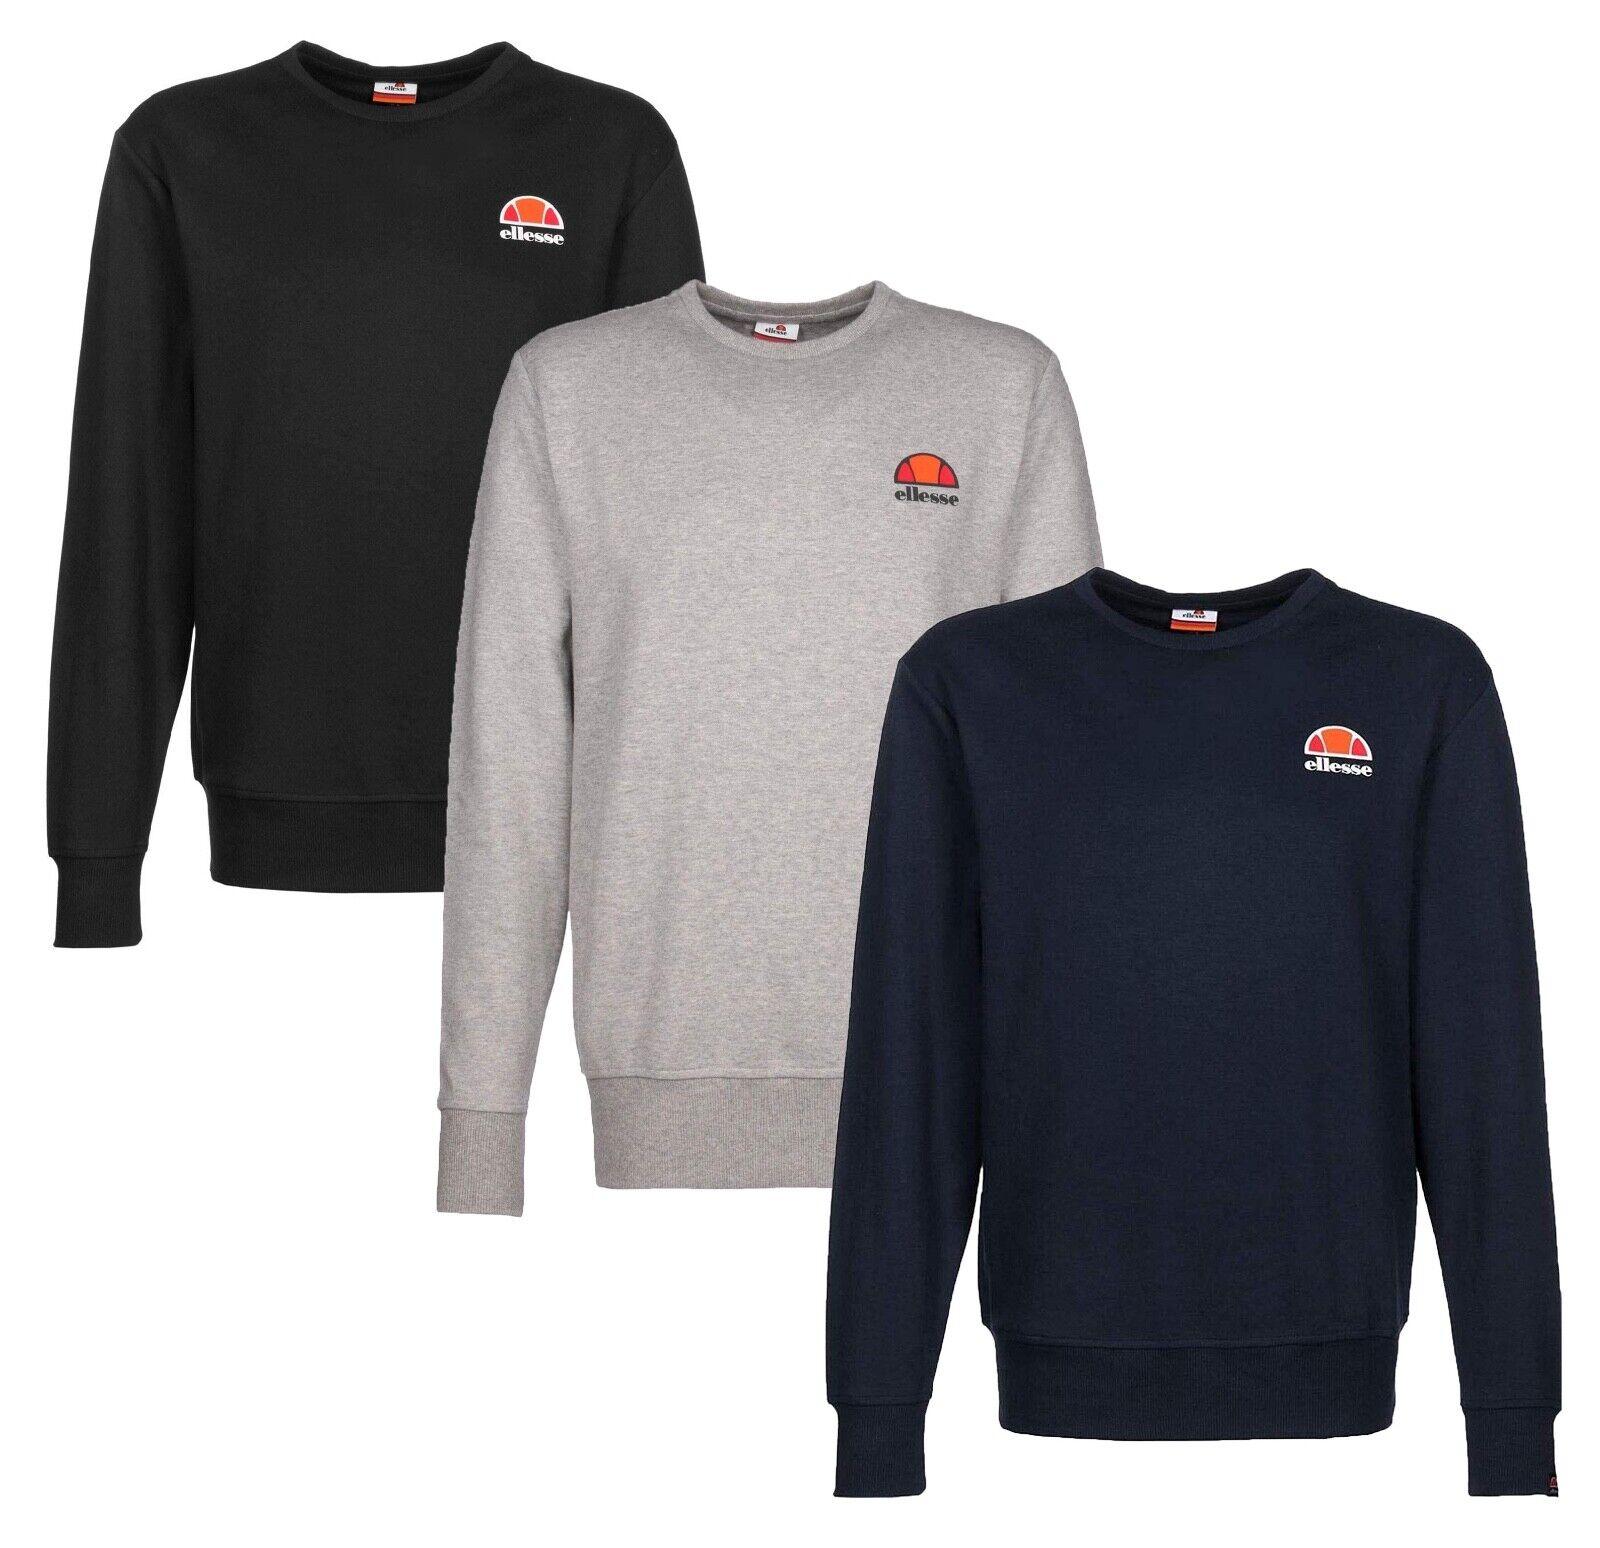 ellesse Mens Perth Crew Neck Retro Logo Sweatshirt Black Blue Grey Sweat Top